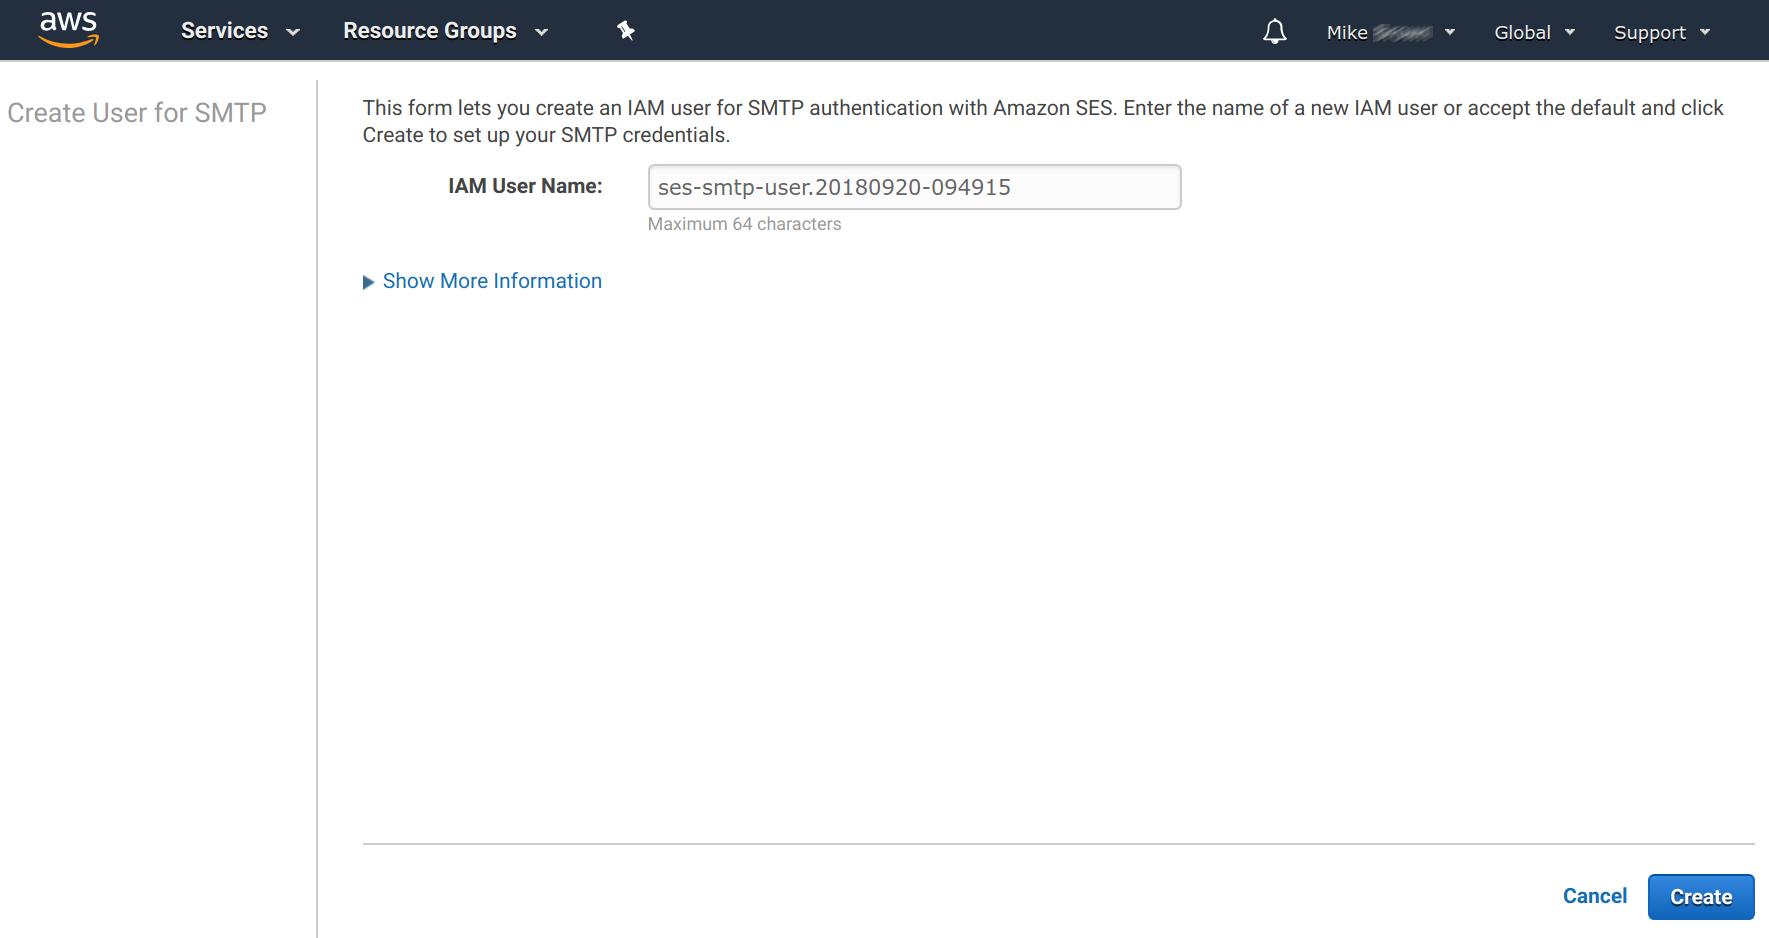 Amazon SES - Creating SMTP User